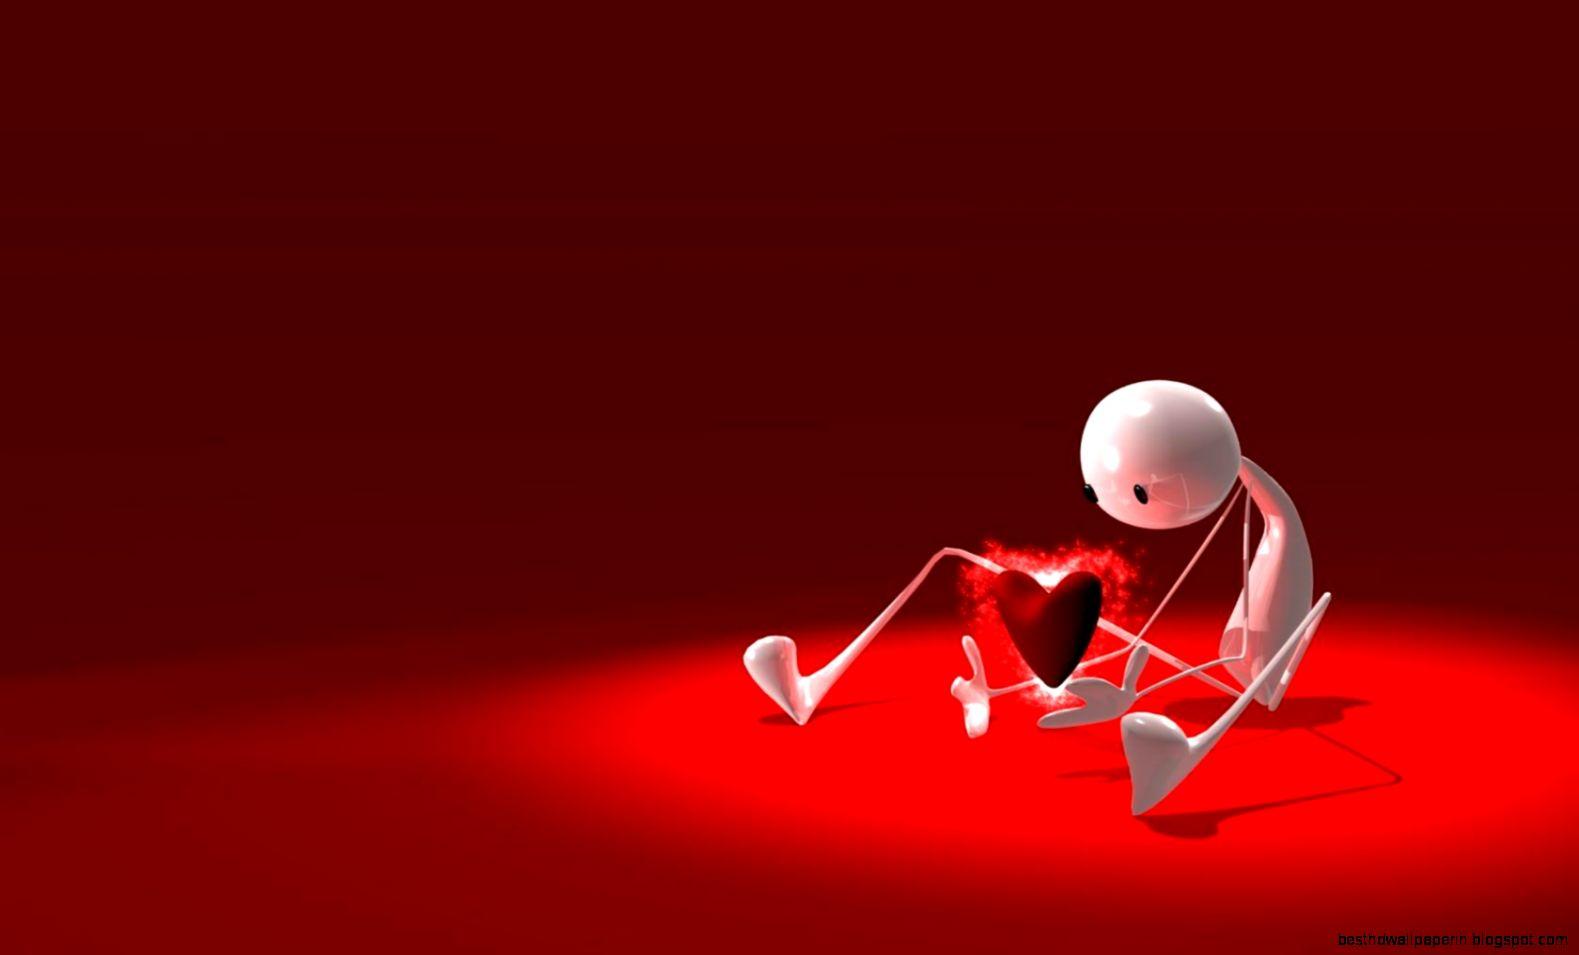 Broken Heart Wallpaper Hd Free Download 4289 Wallpaper